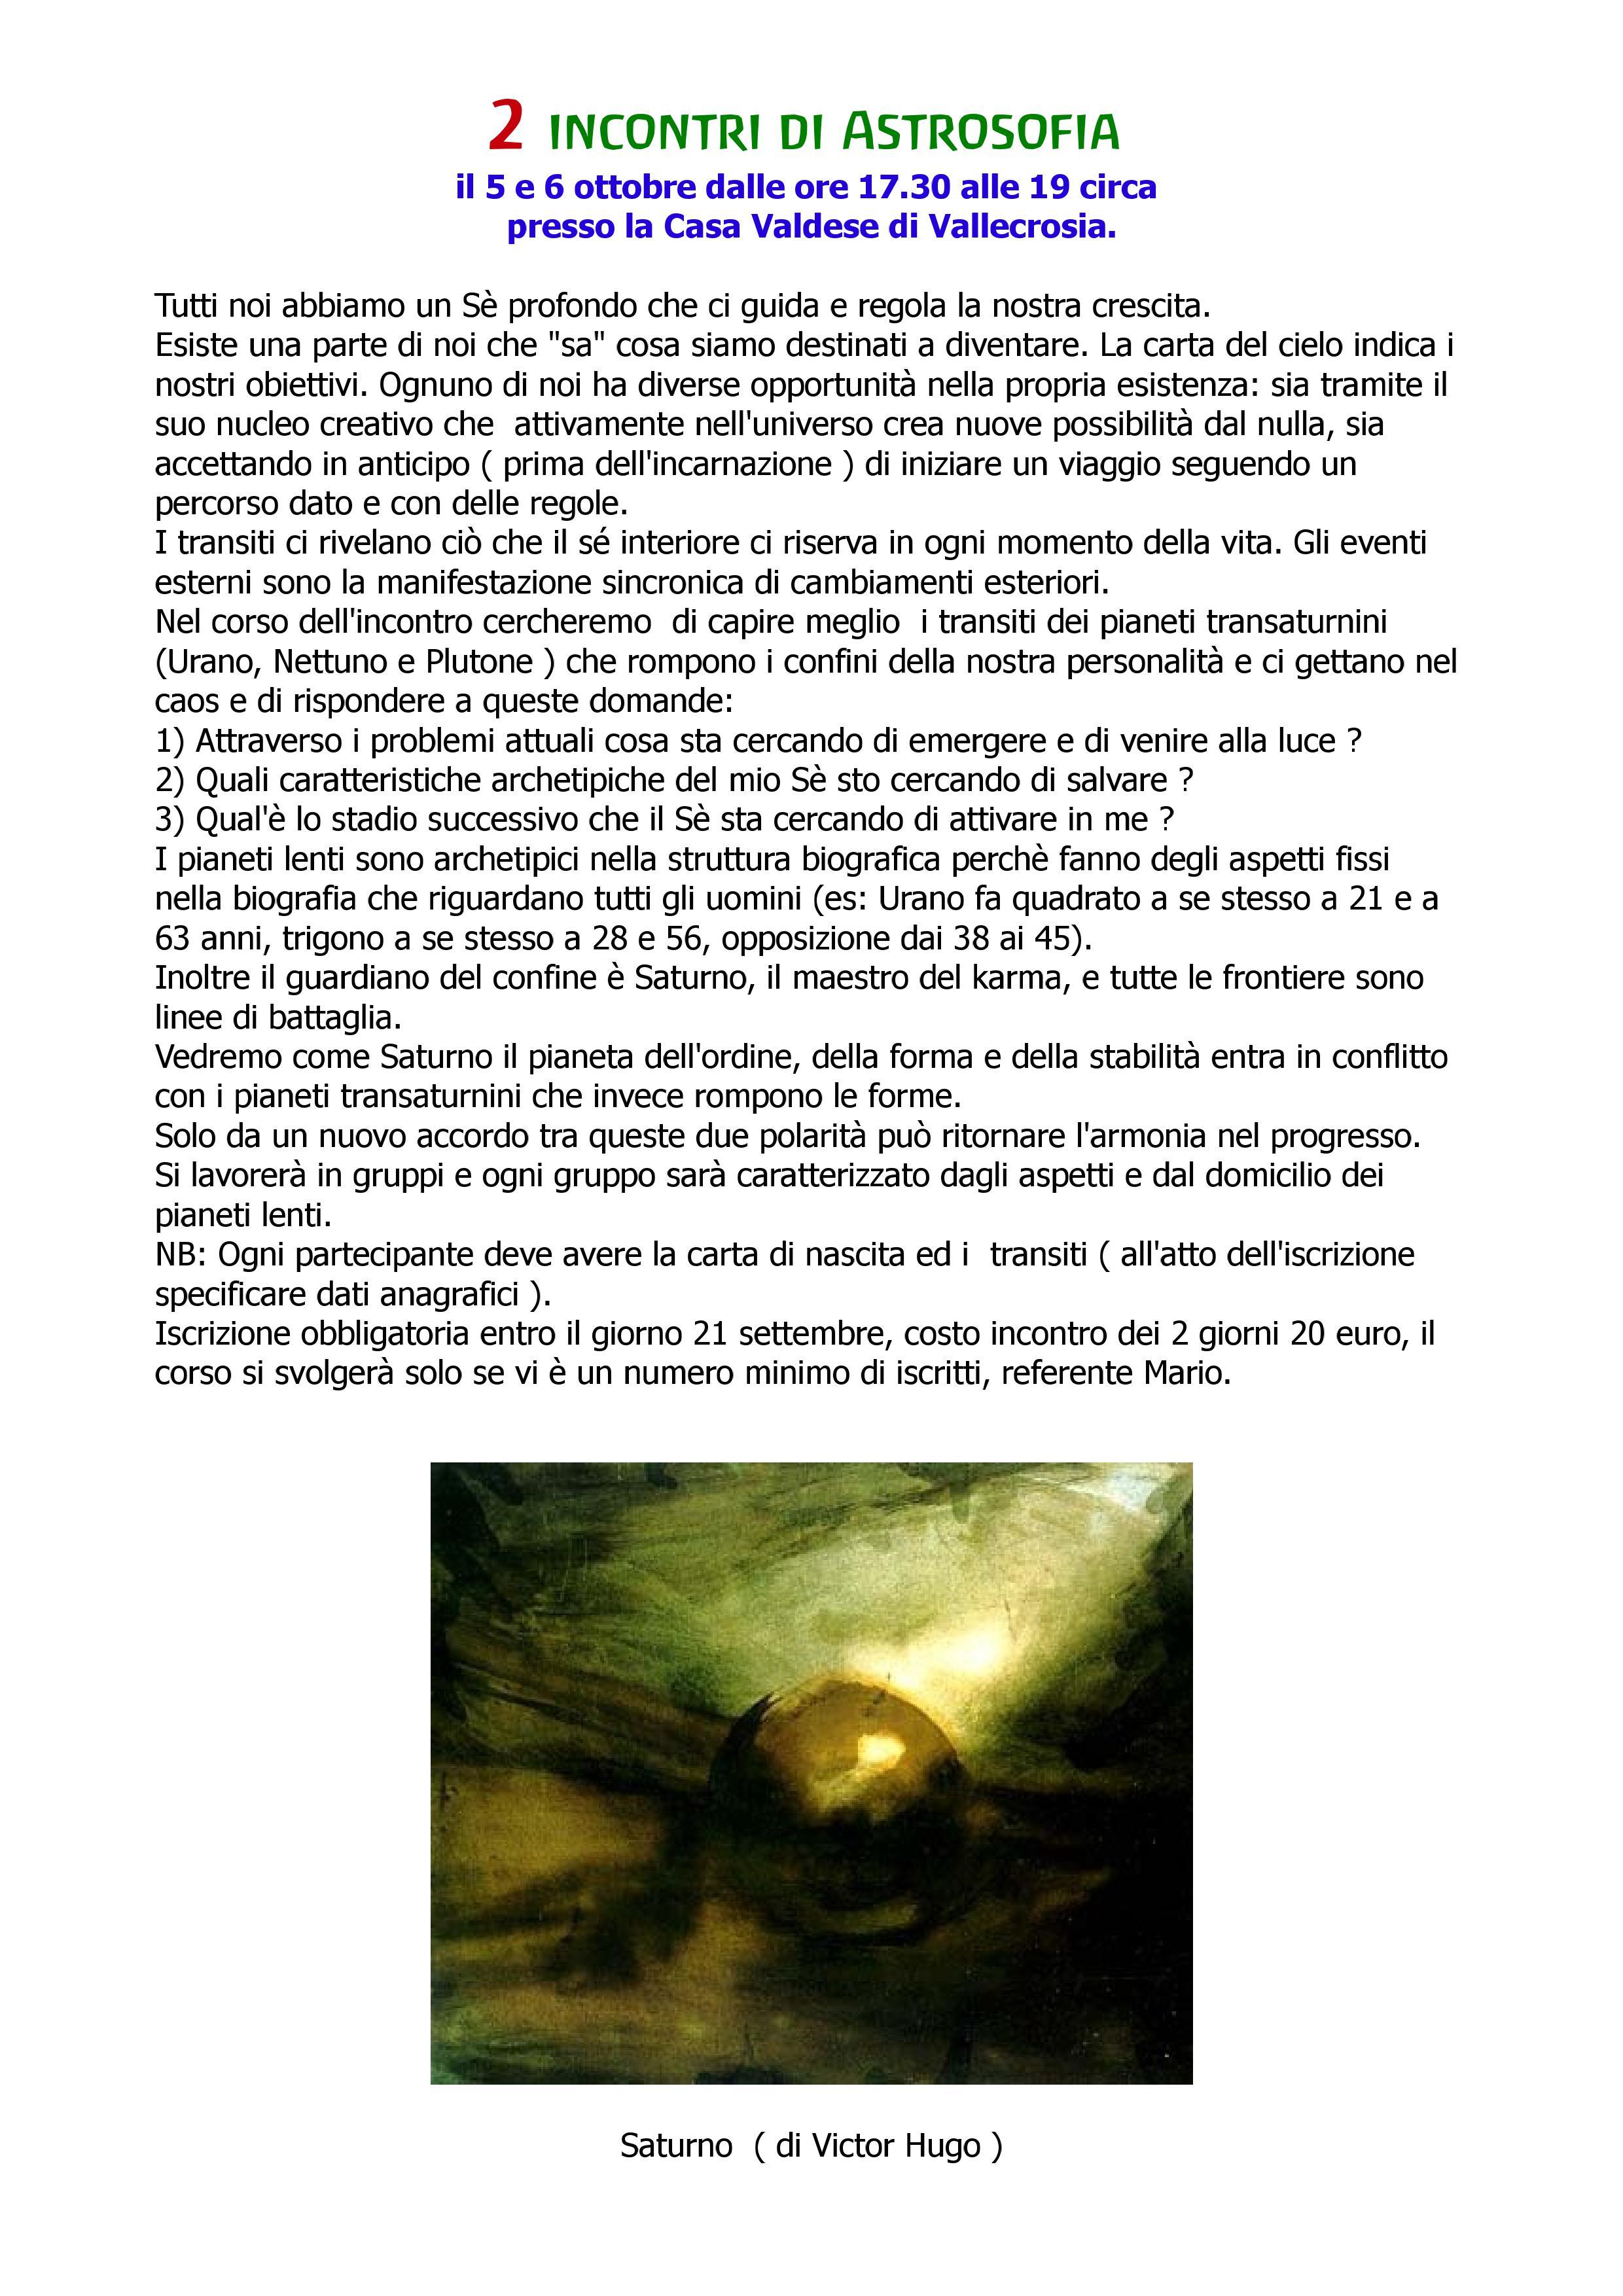 astrosofia1